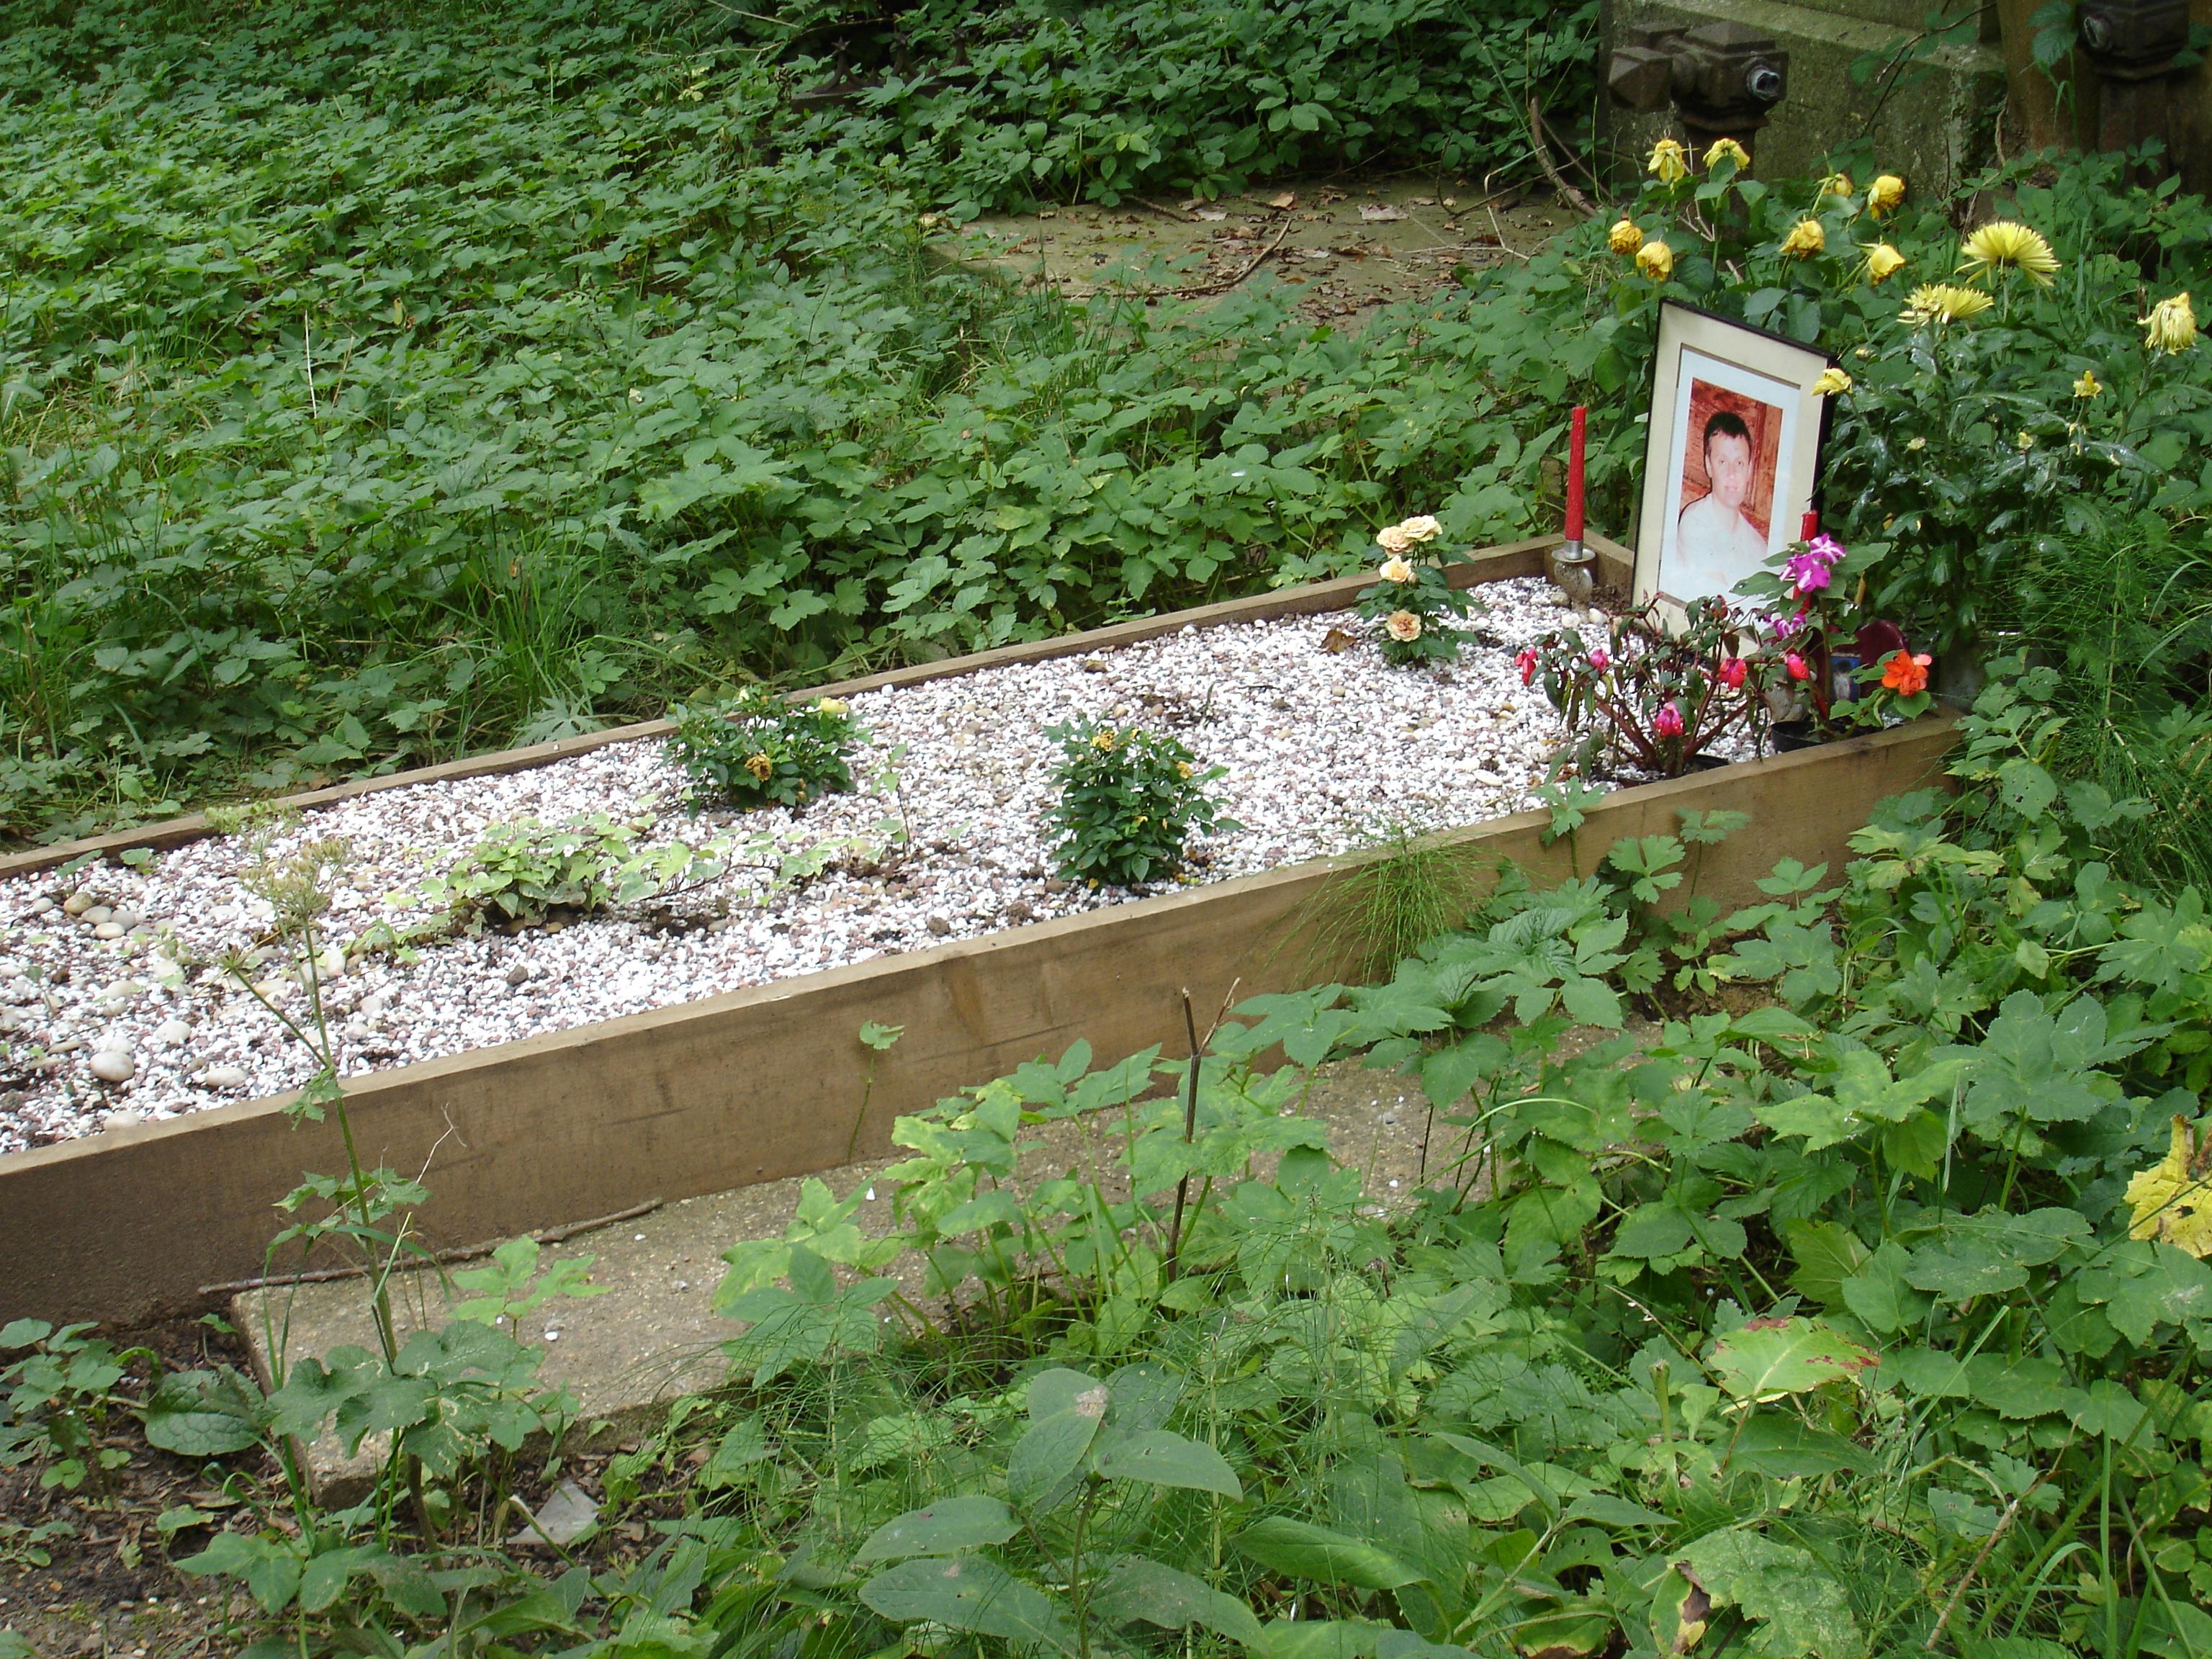 Photograph of the grave of Alexander Litvinenk...